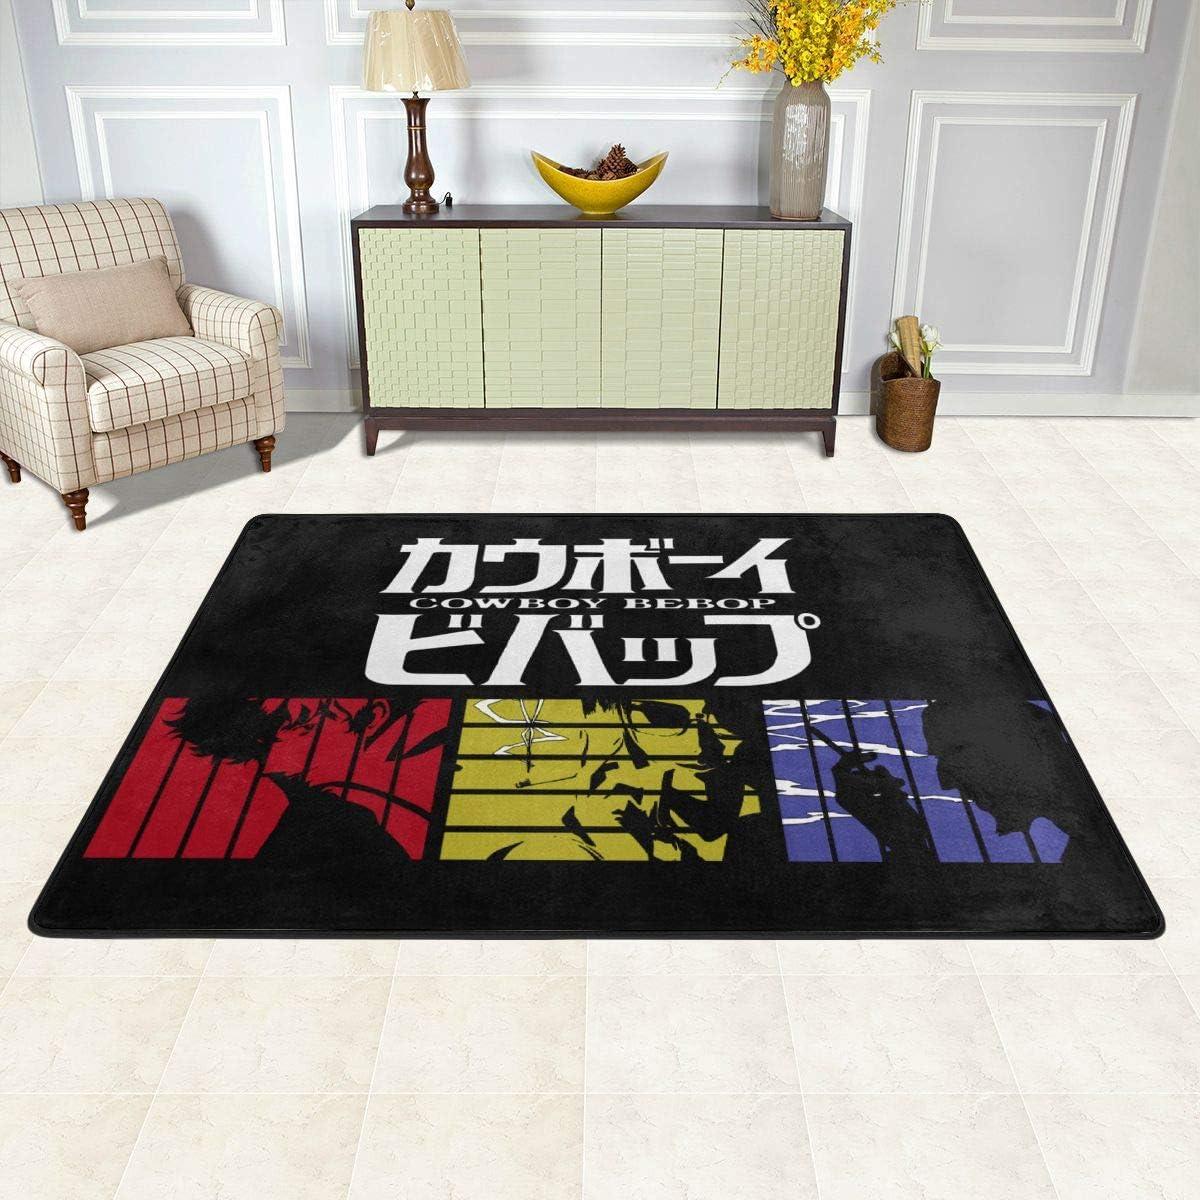 Cowboy Bebop Rug Anime Design Rectangular Non-Slip Absorbent Carpet Indoor Terrace Outdoor – Multi-Size Model Carpet Carpet 72 x48